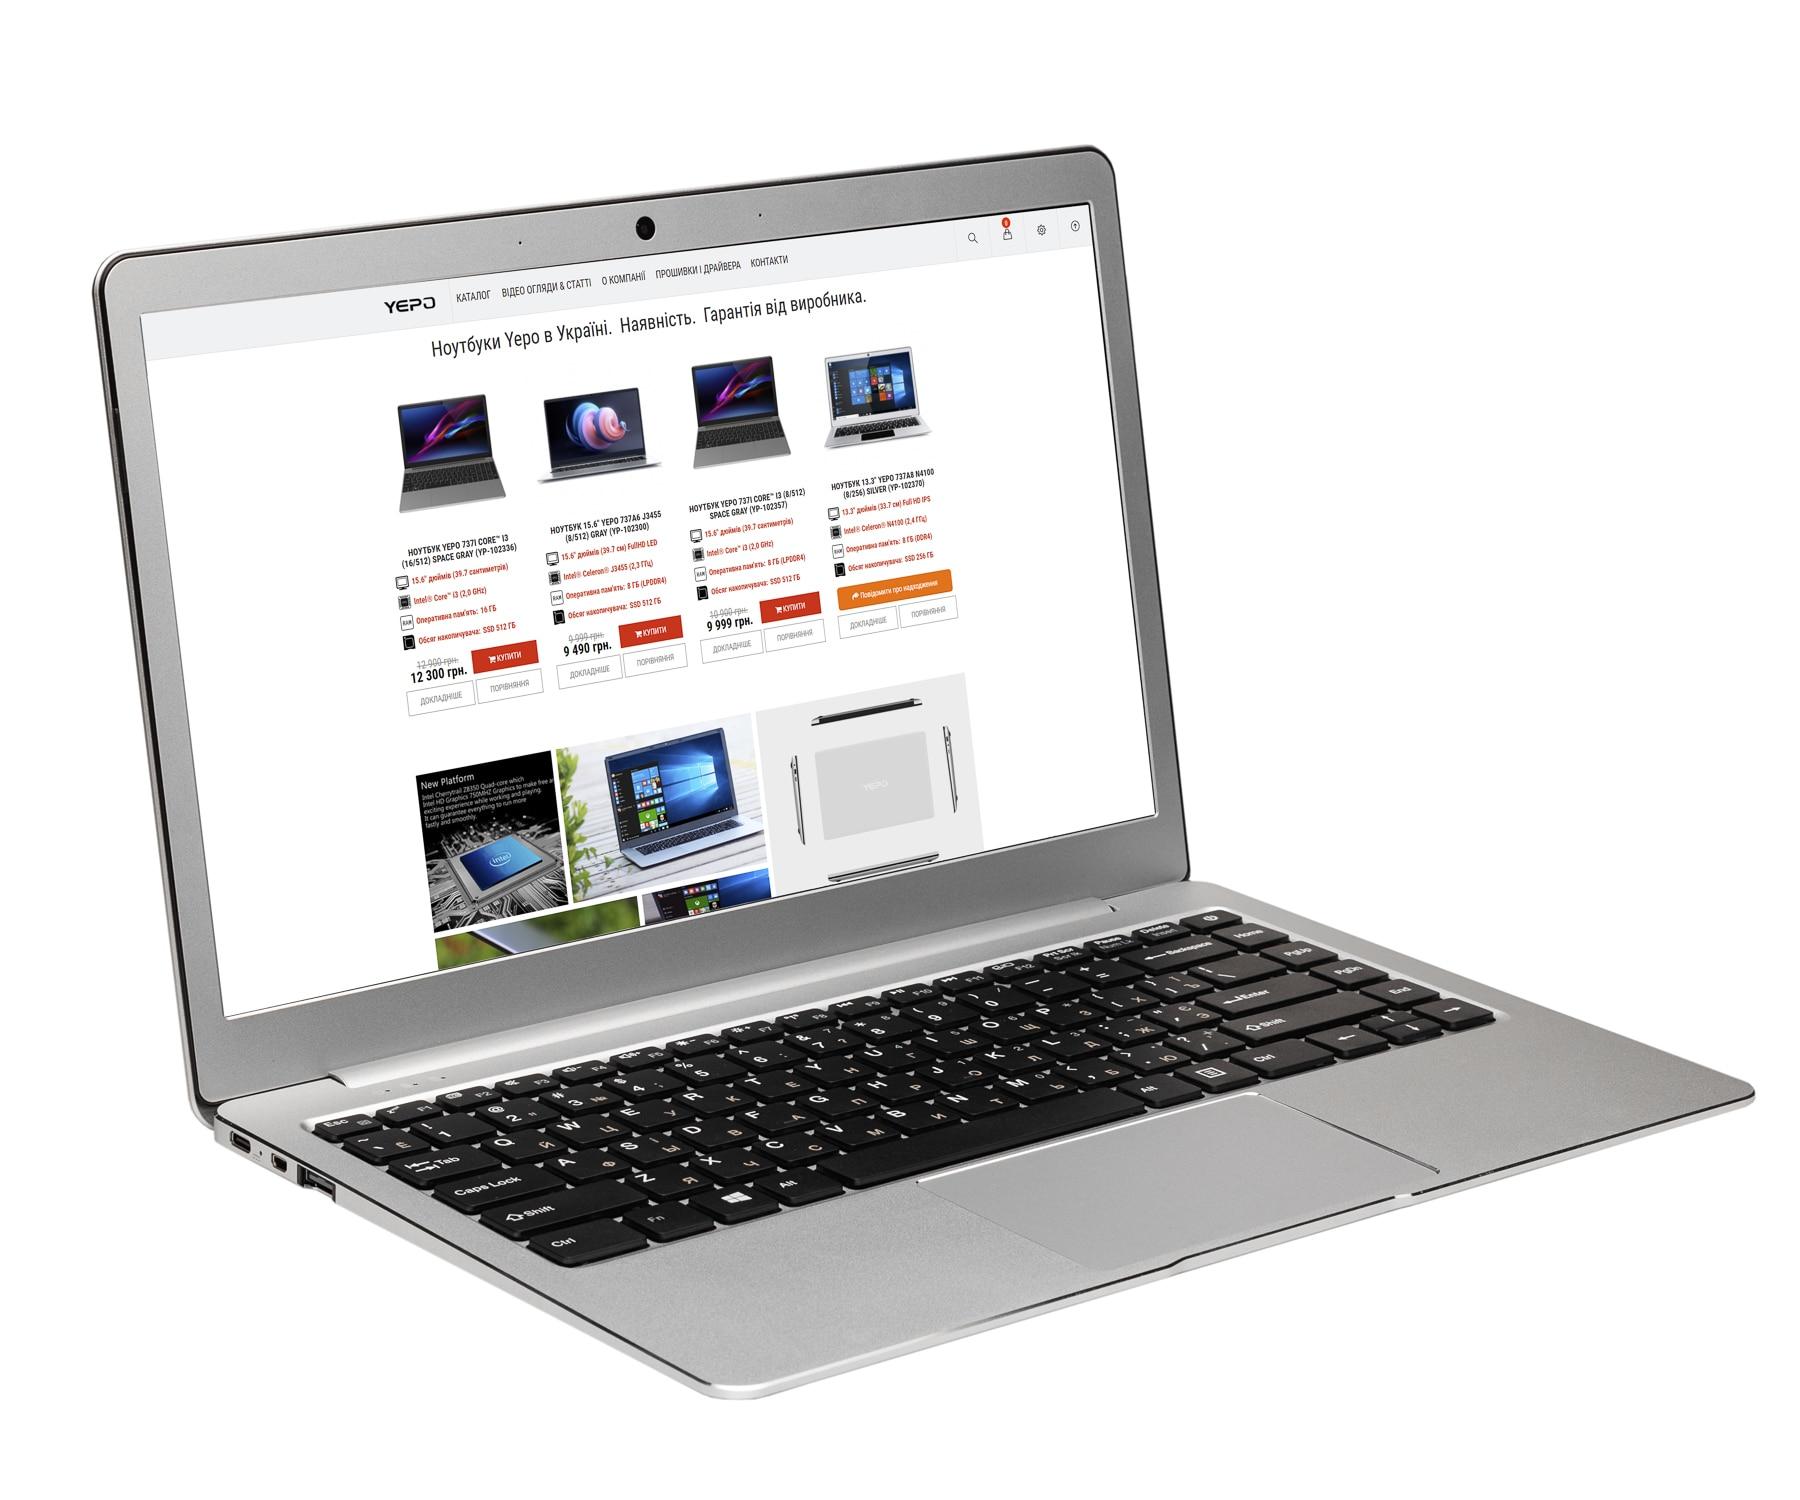 Notebook Laptop Air 13.3 Quad-Core Enhanced Edition Fingerprint Recognition Intel i5 8250U 8GB 256GB Win 10 laptop